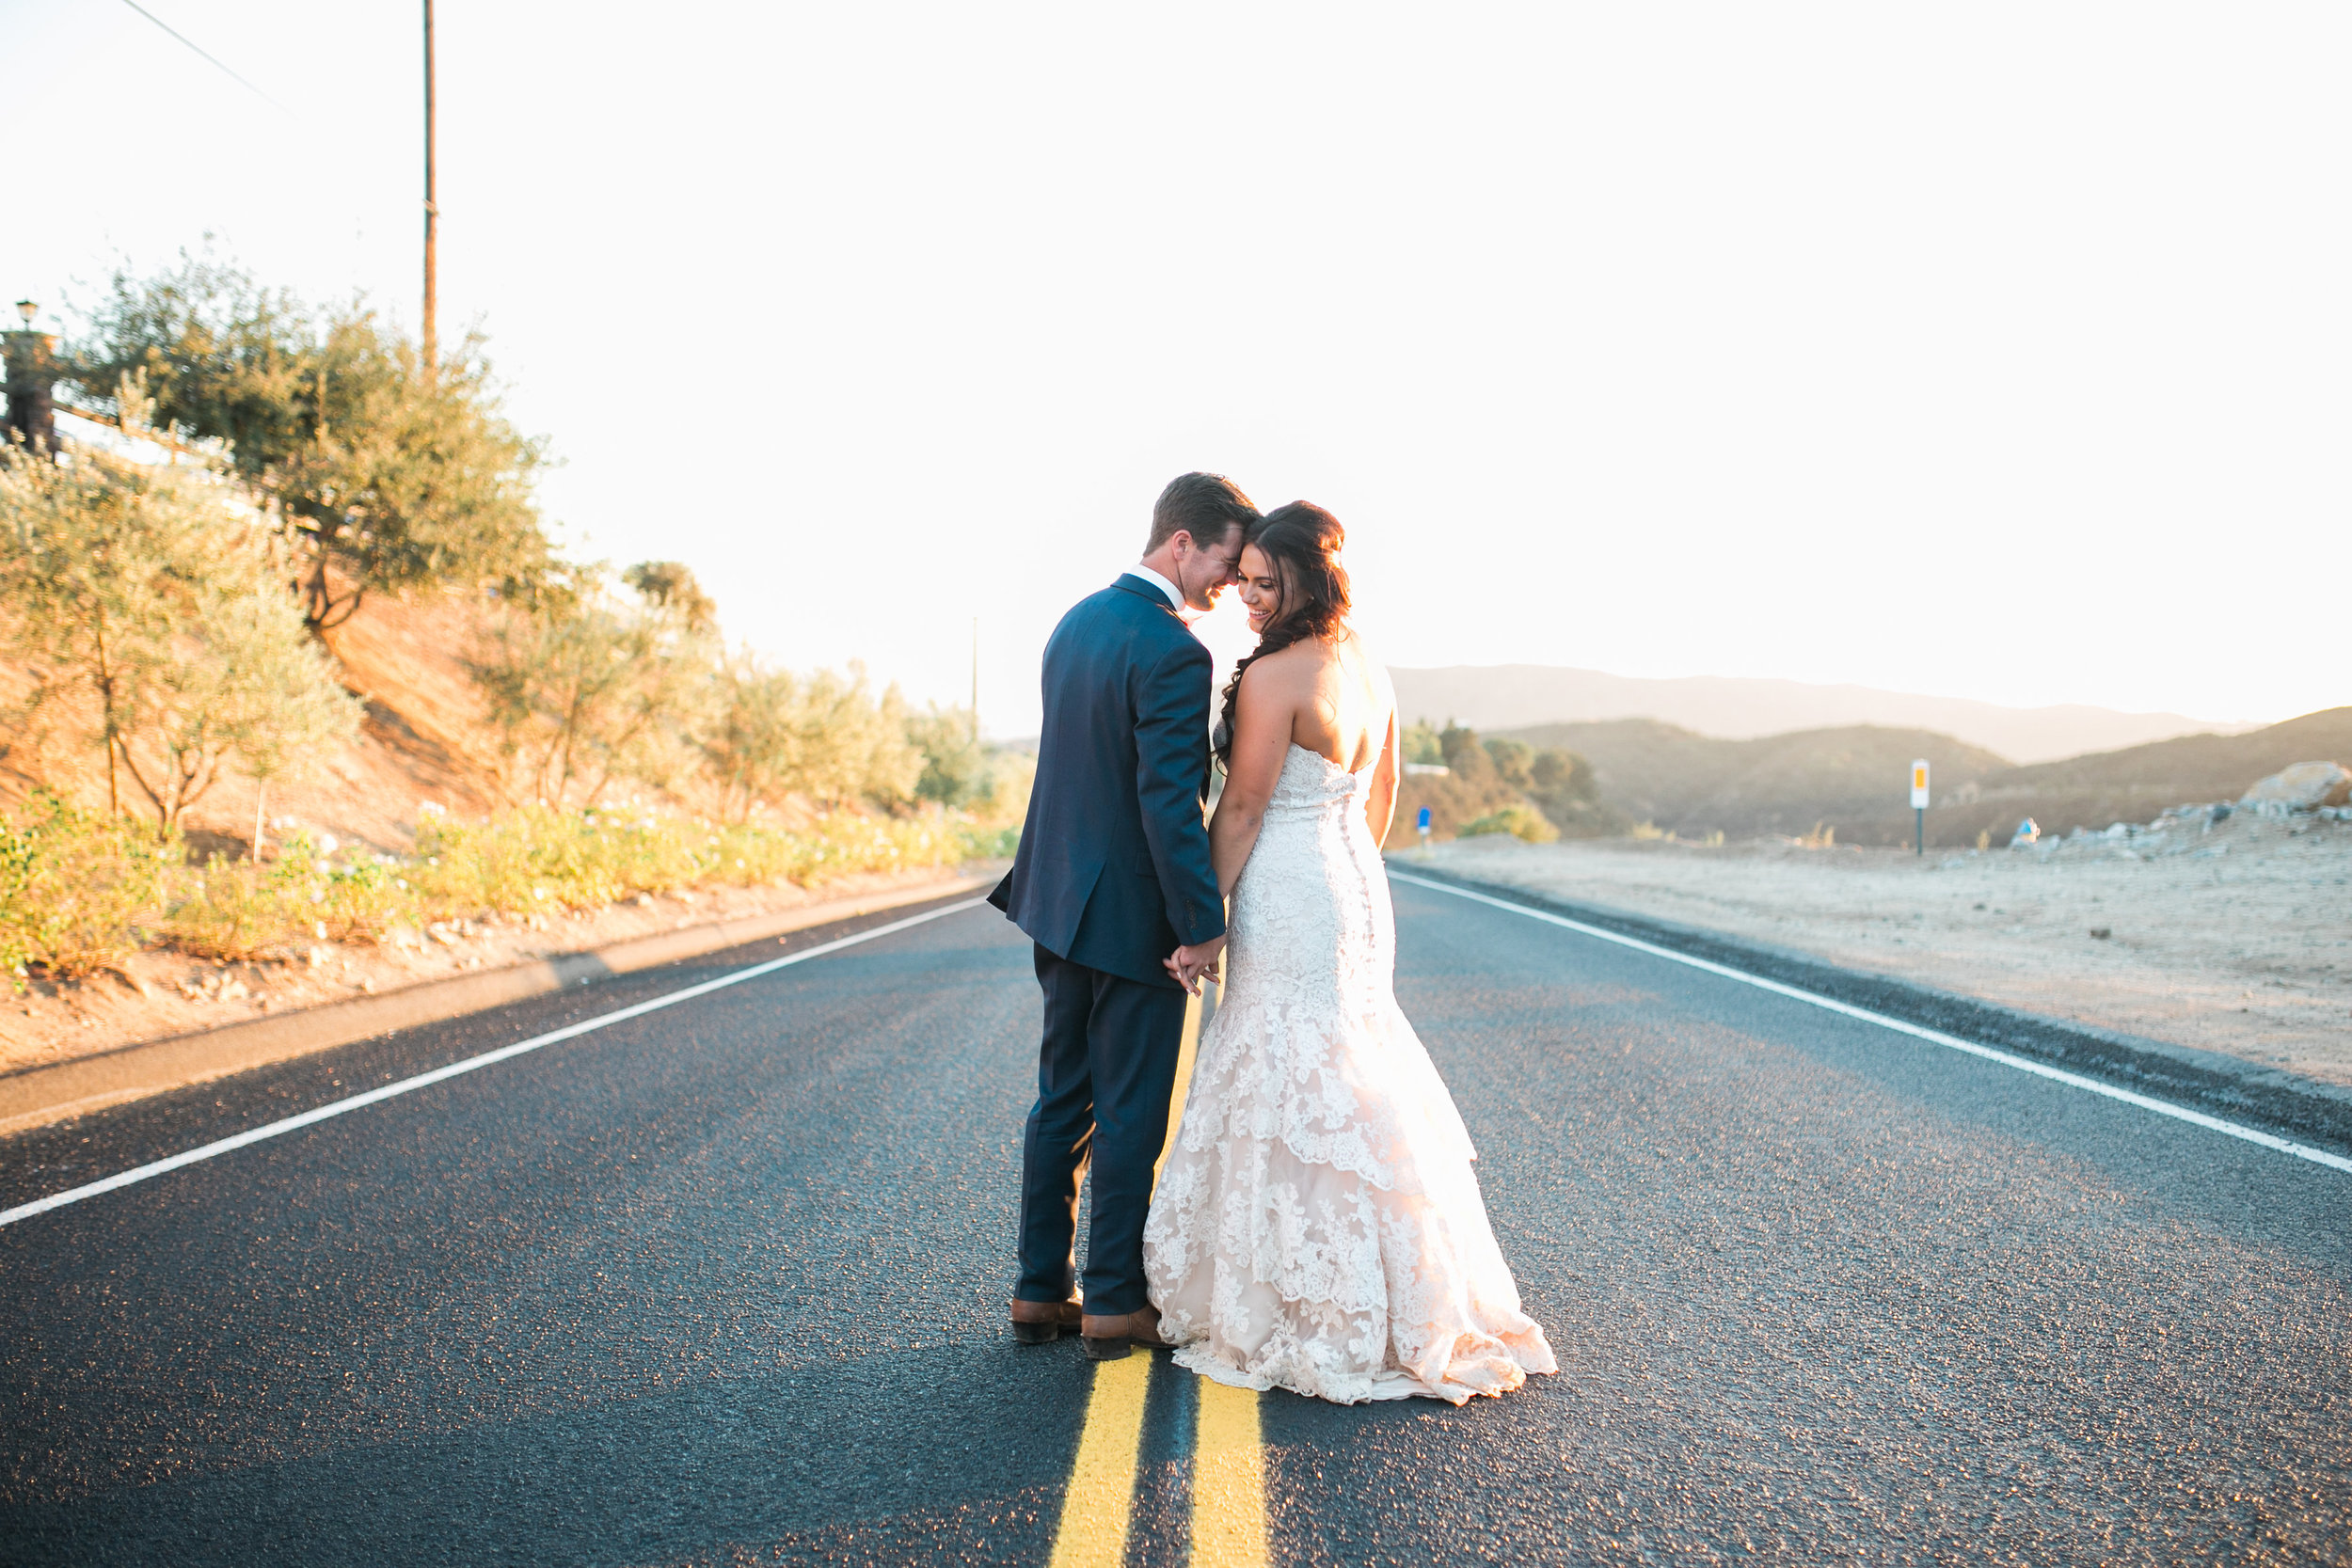 Newlyweds-131.jpg